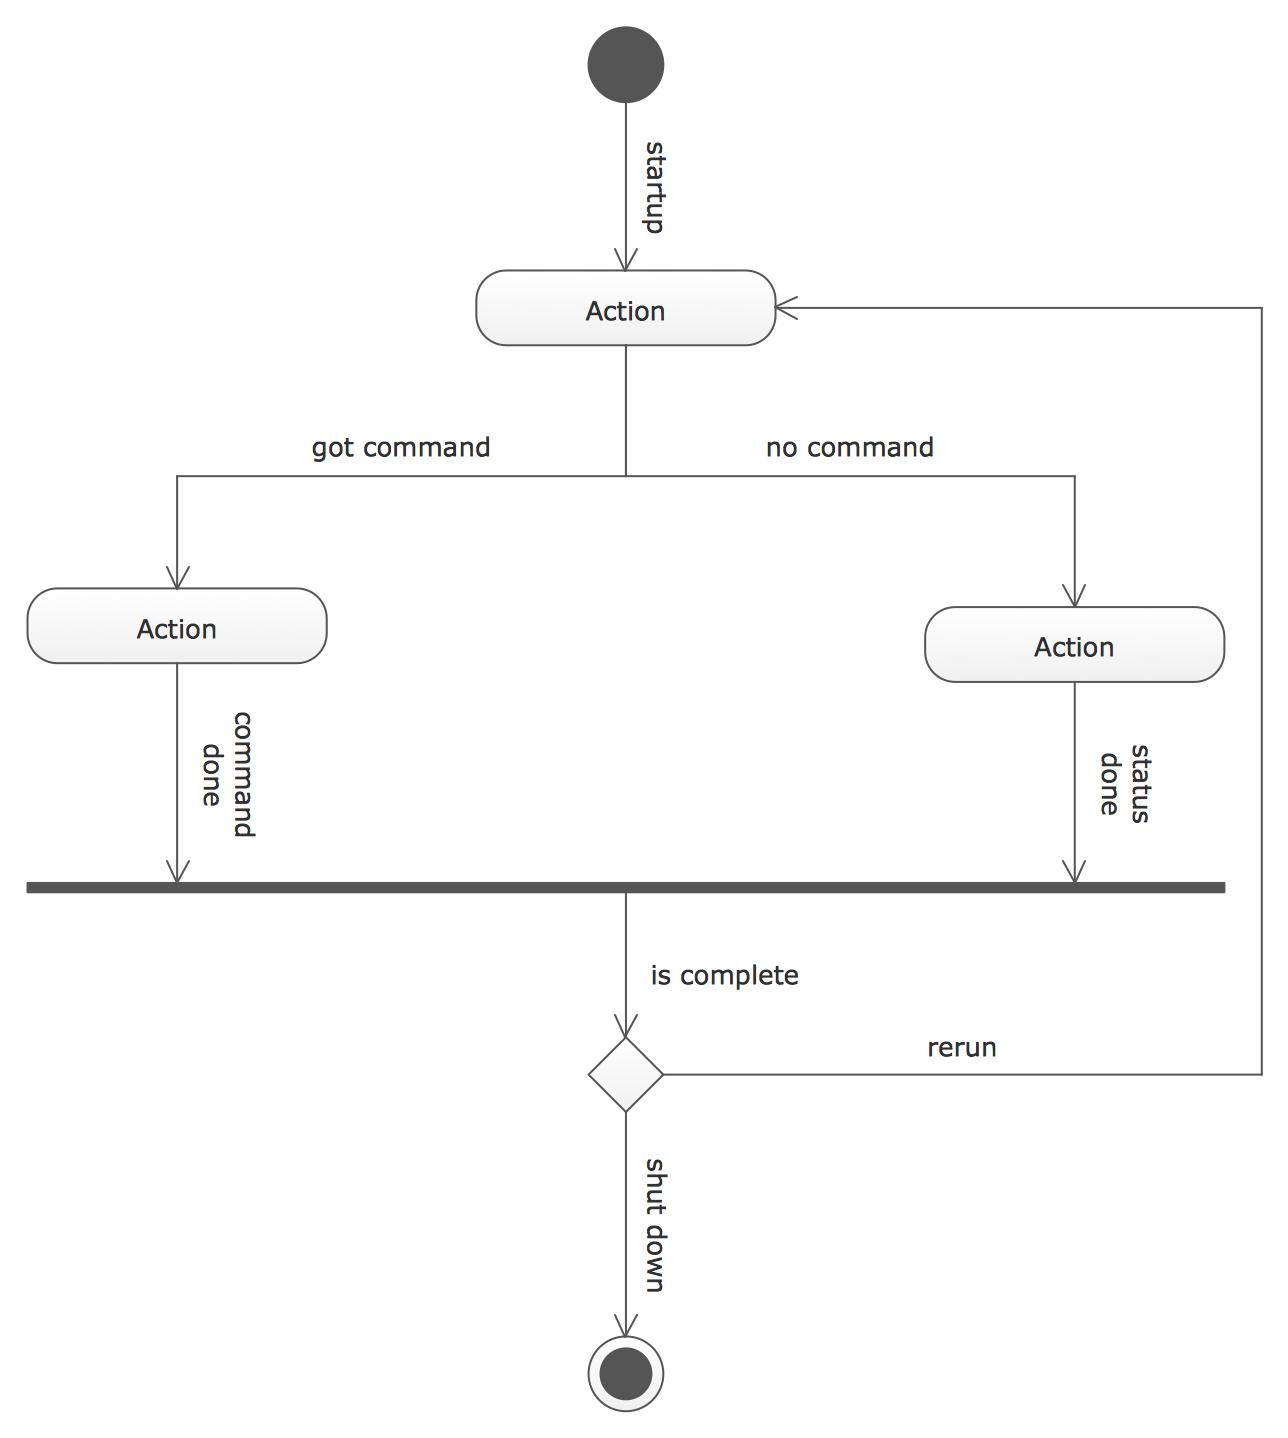 Uml diagram software conceptdraw for mac pc create uml diagrams uml activity diagram template ccuart Gallery